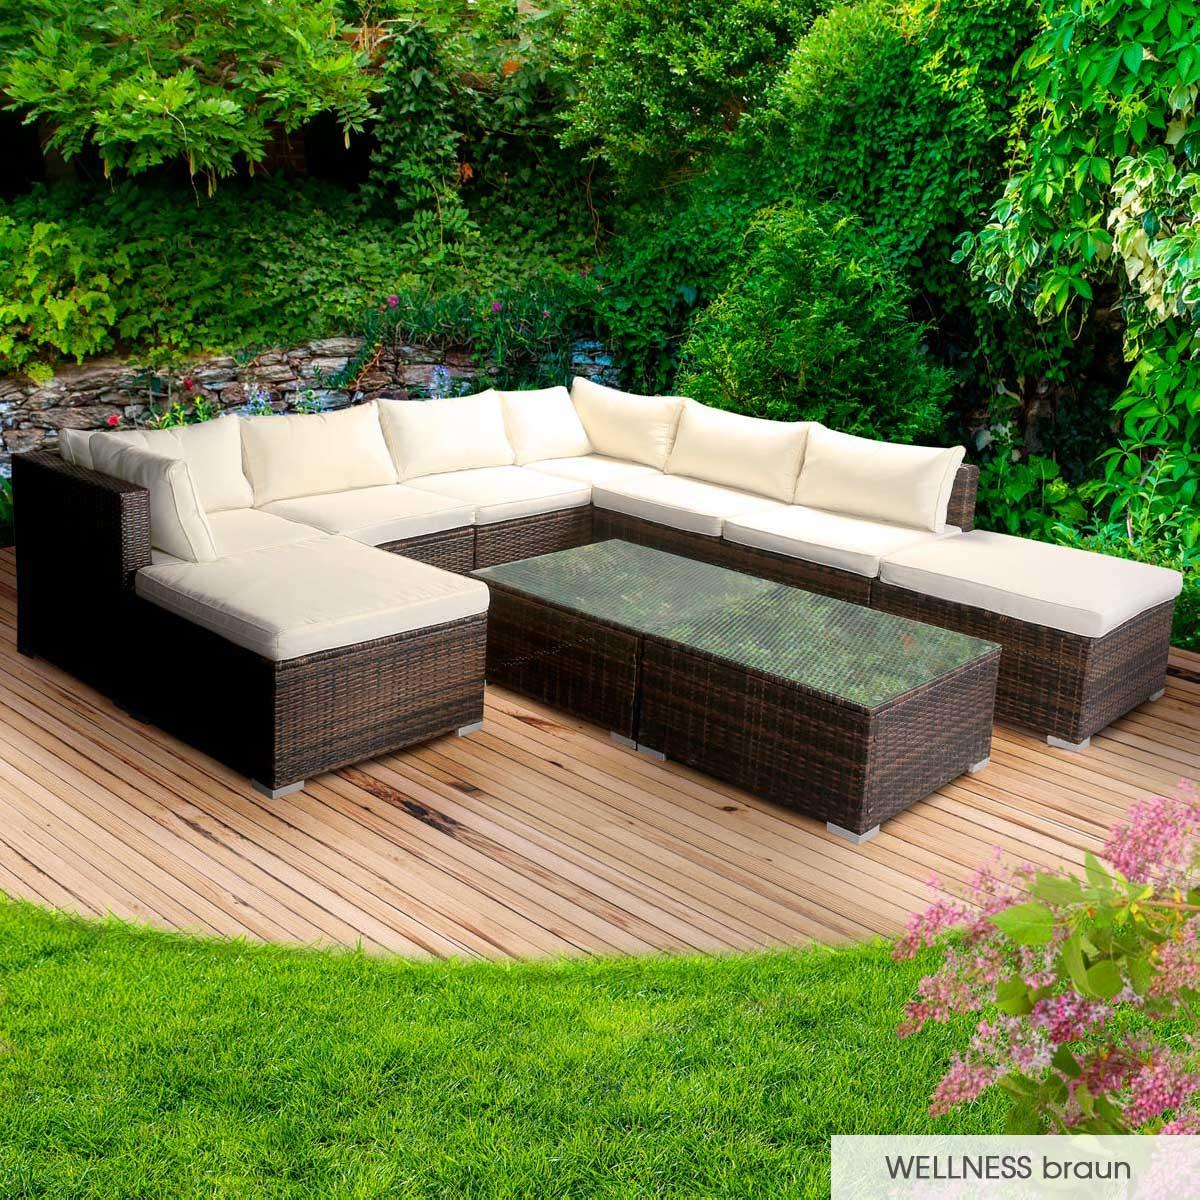 Gartenmoebel-Poly-Rattan-Lounge-Moebel-Sitzgarnitur-Gartengarnitur-Sitzgruppe-Sofa Indexbild 41